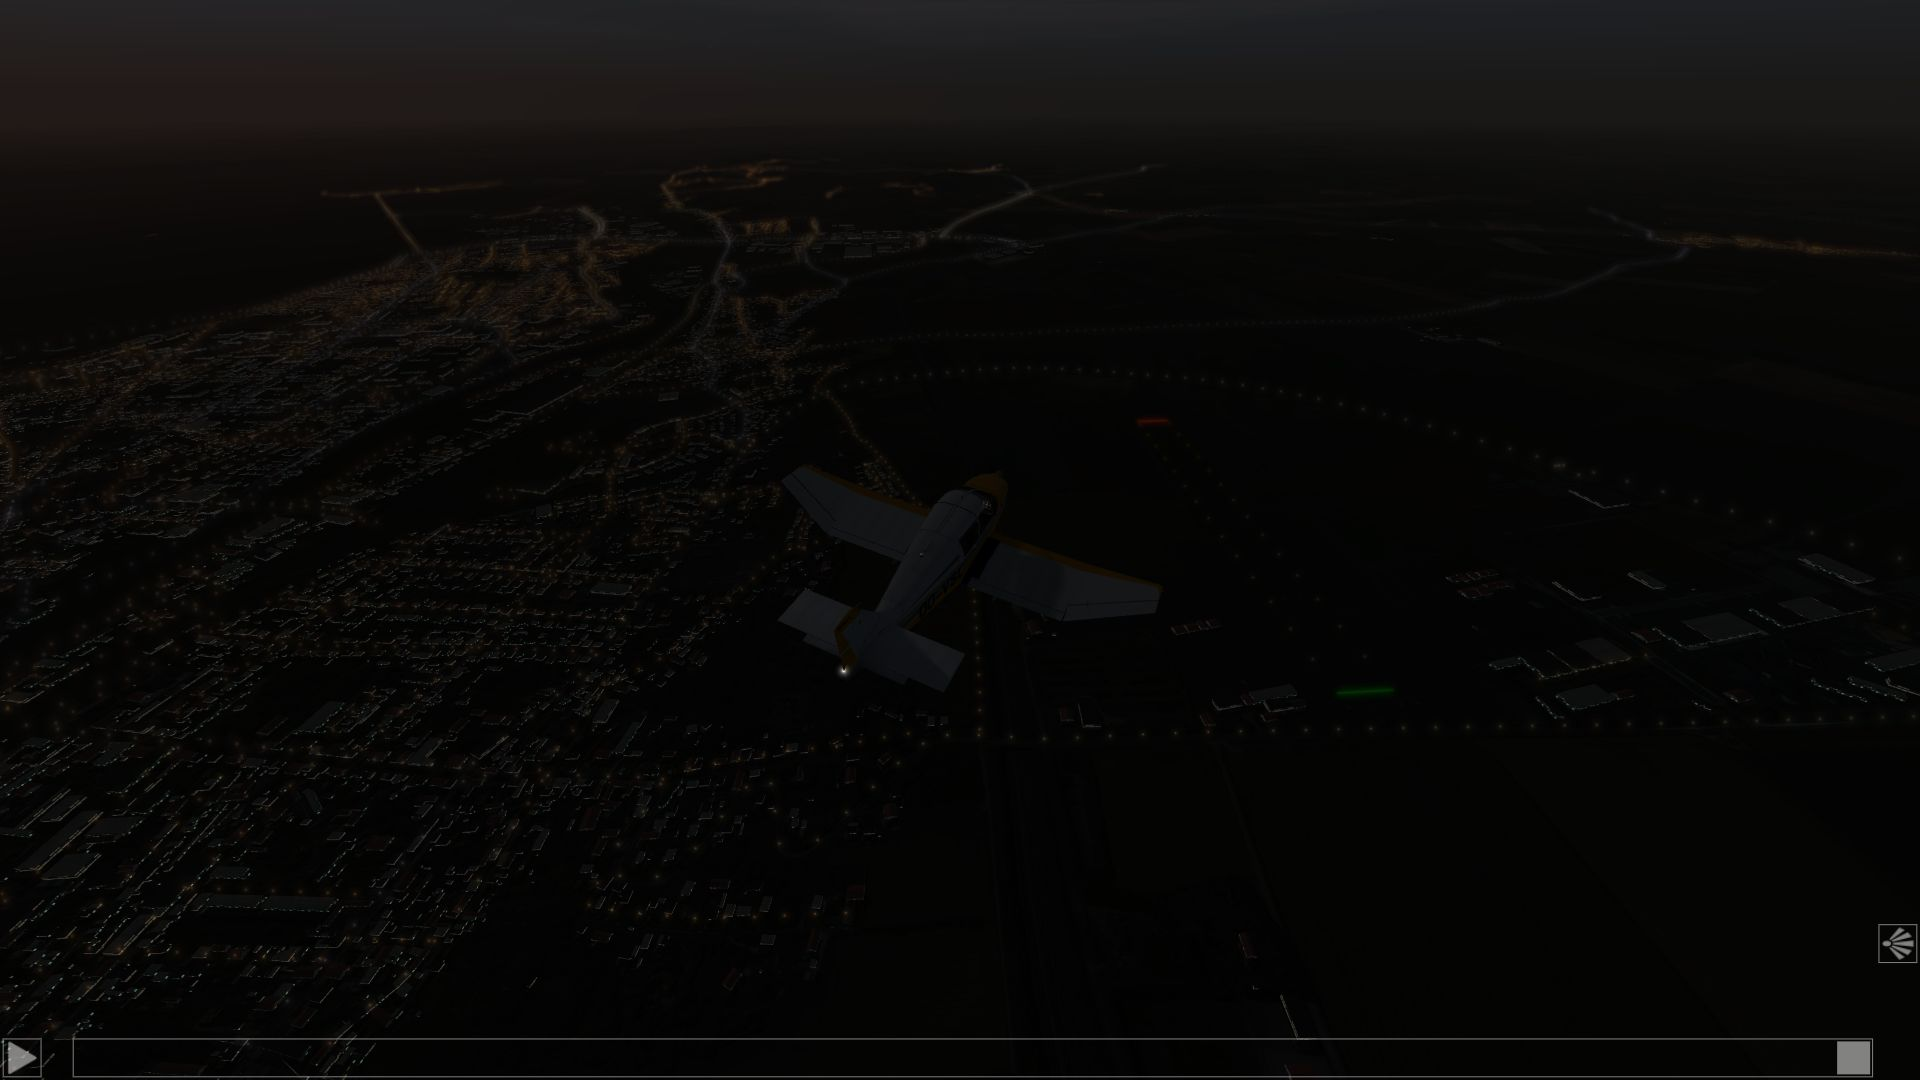 http://www.pilote-virtuel.com/img/gallery/1517065661.jpg